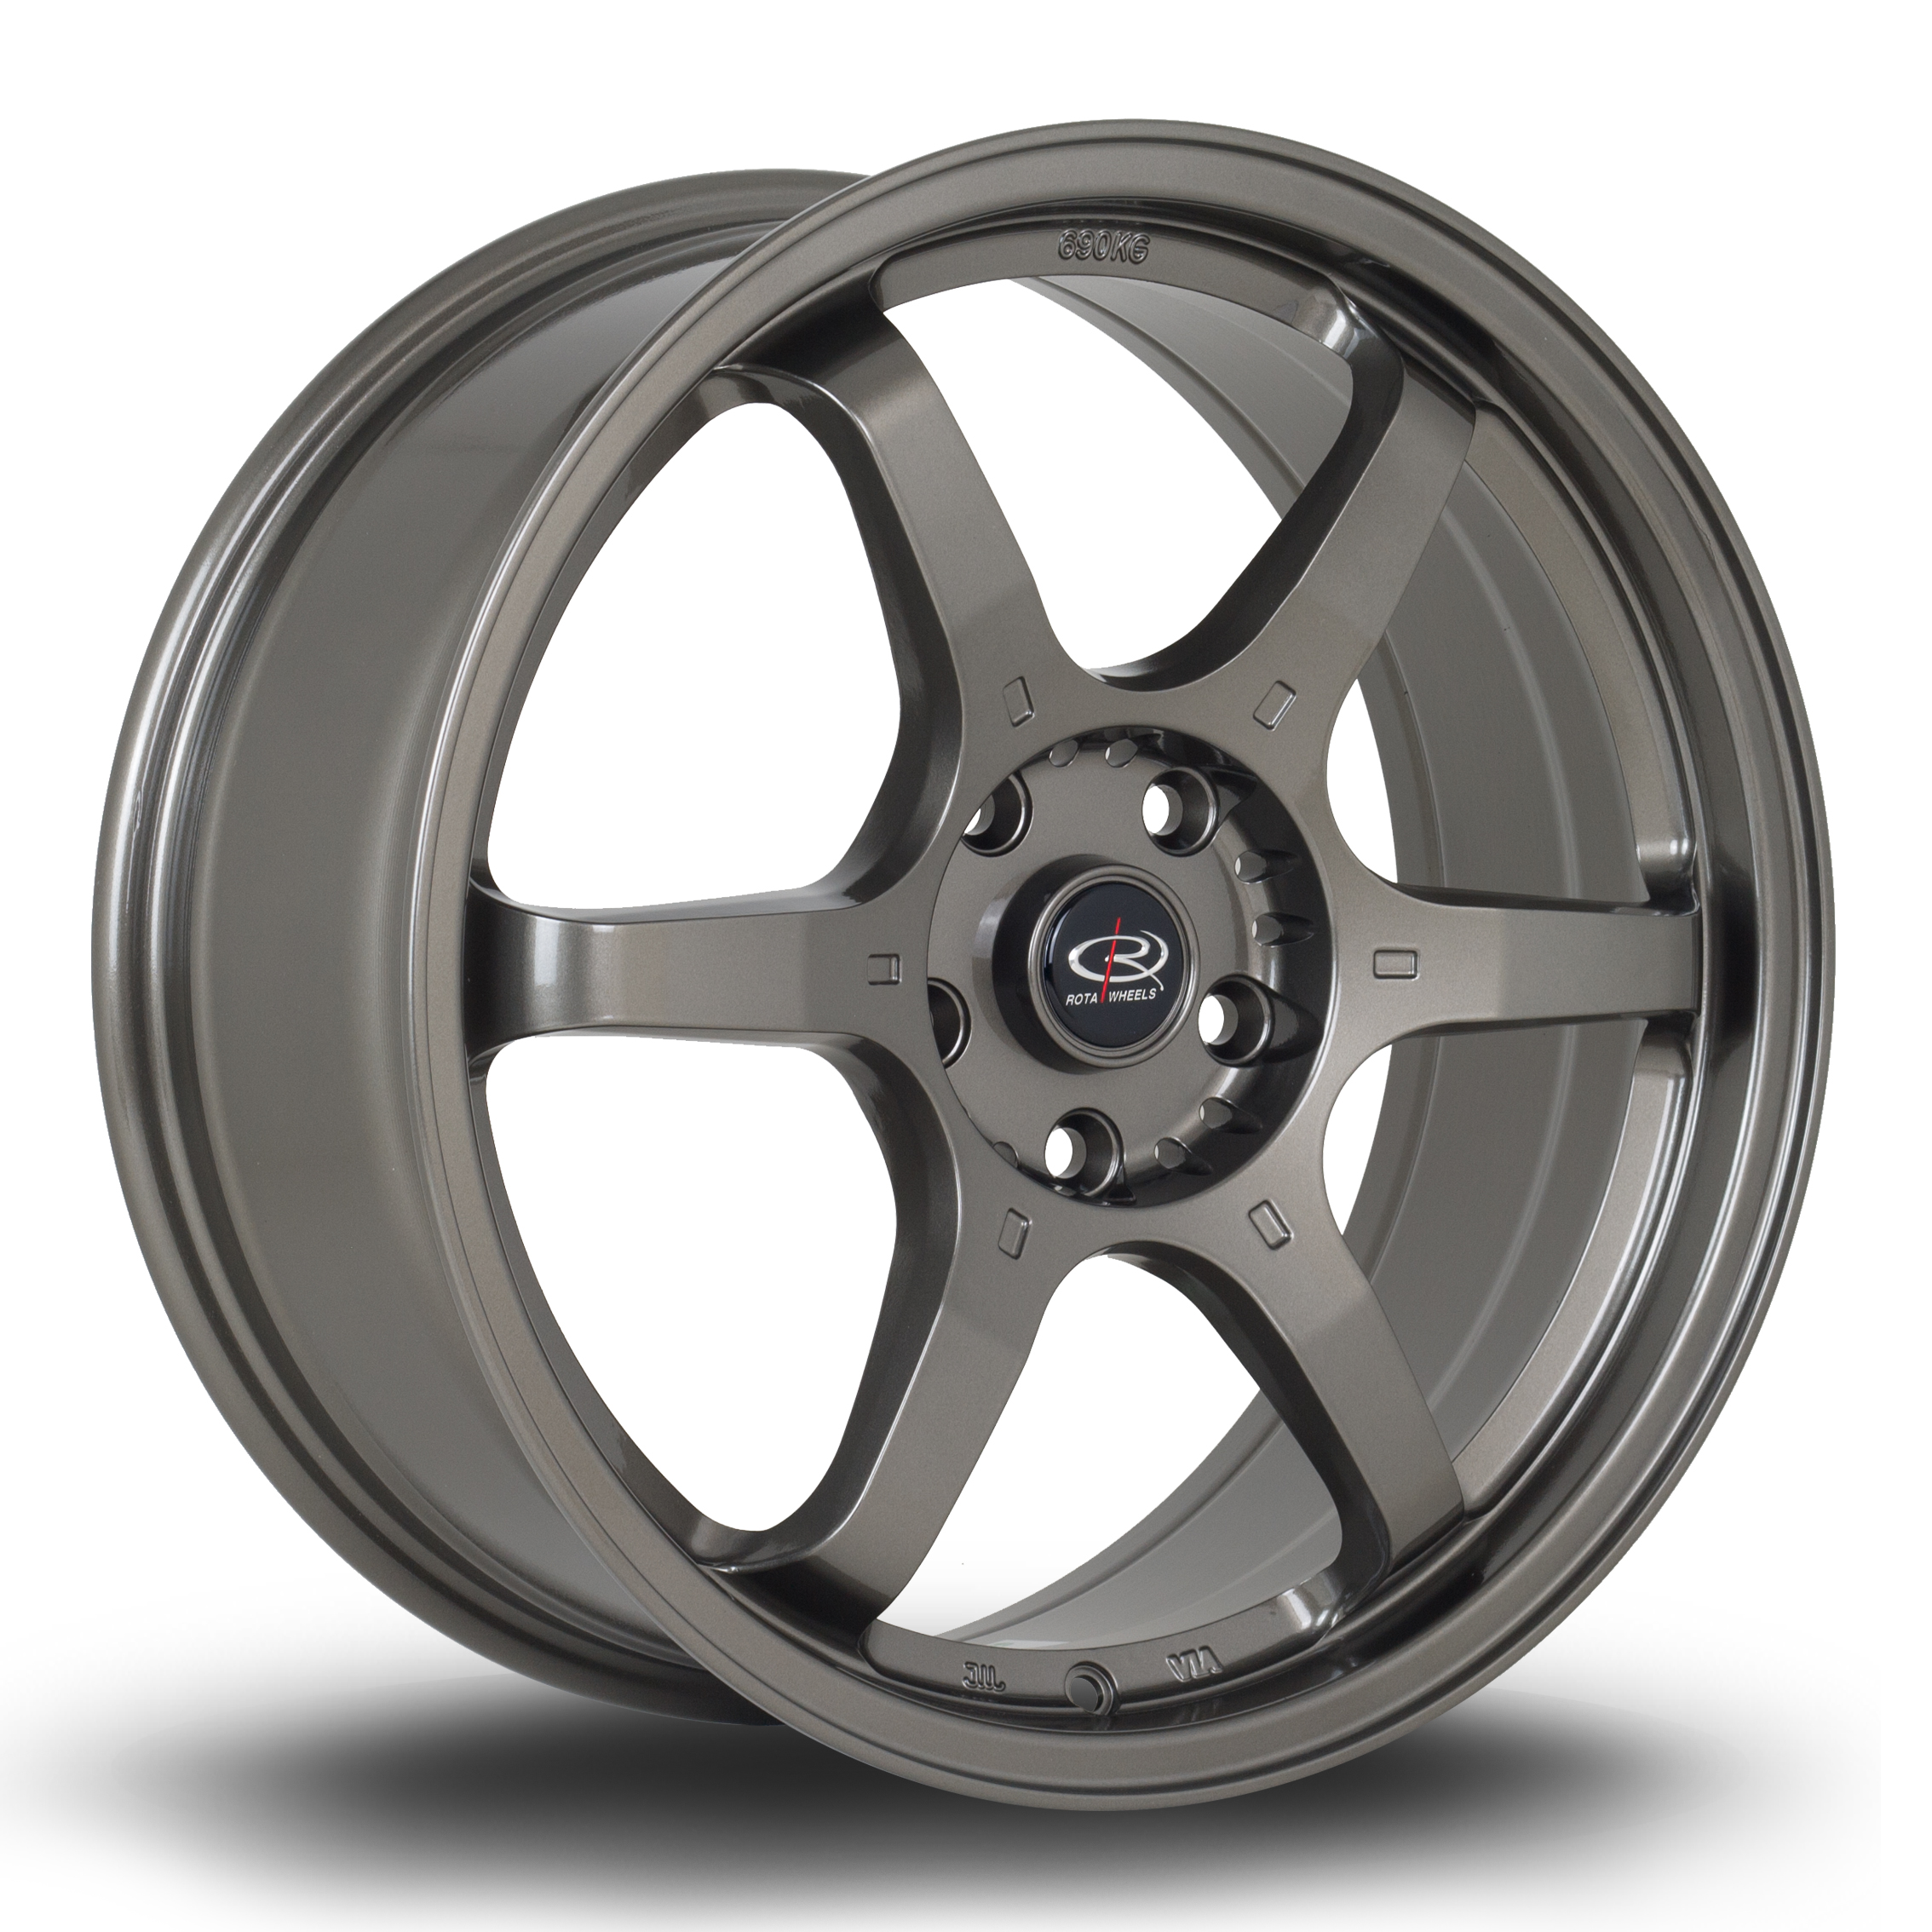 Rota GR6 wheels